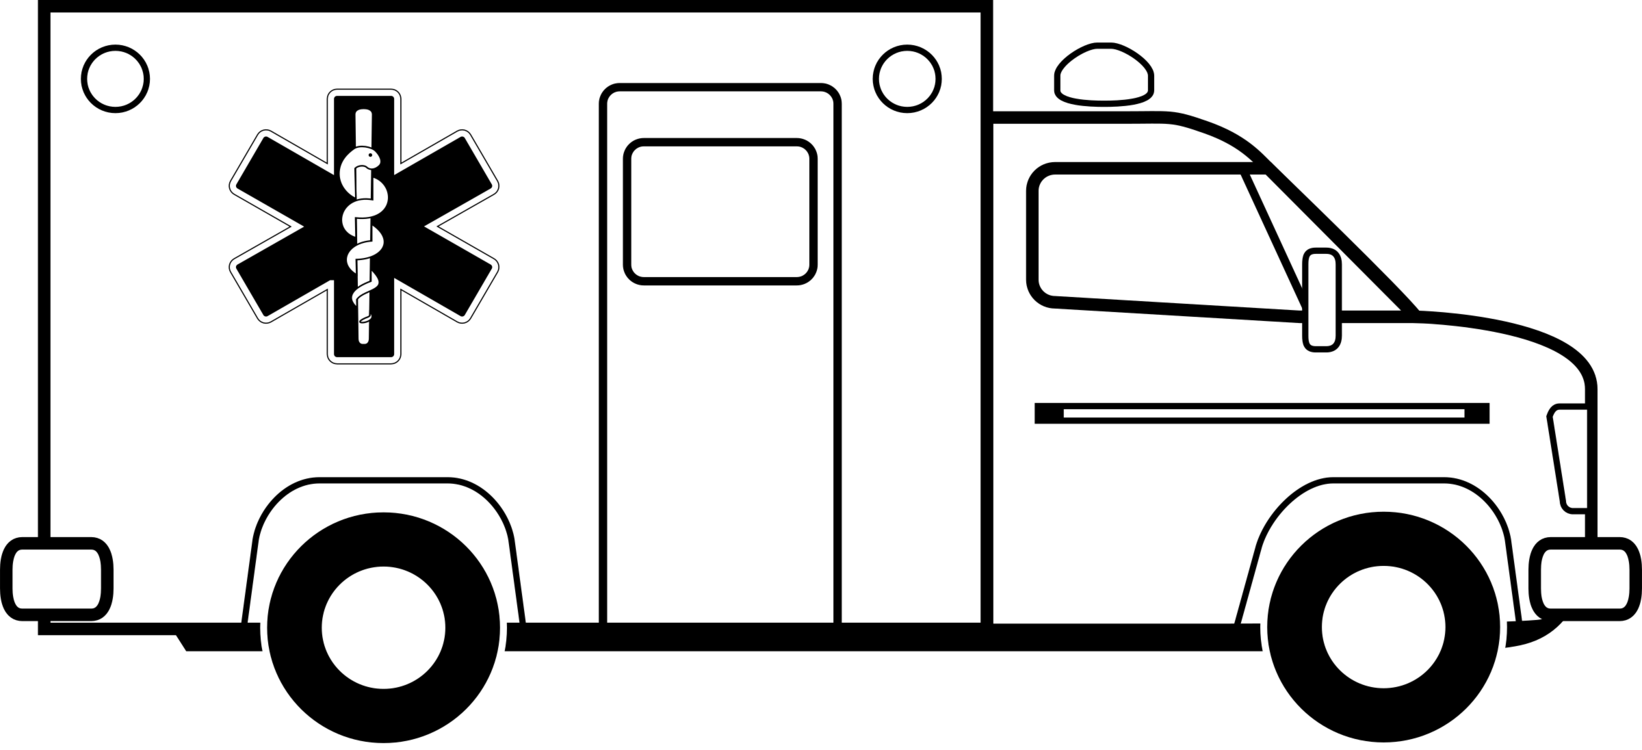 Angle,Compact Car,Area